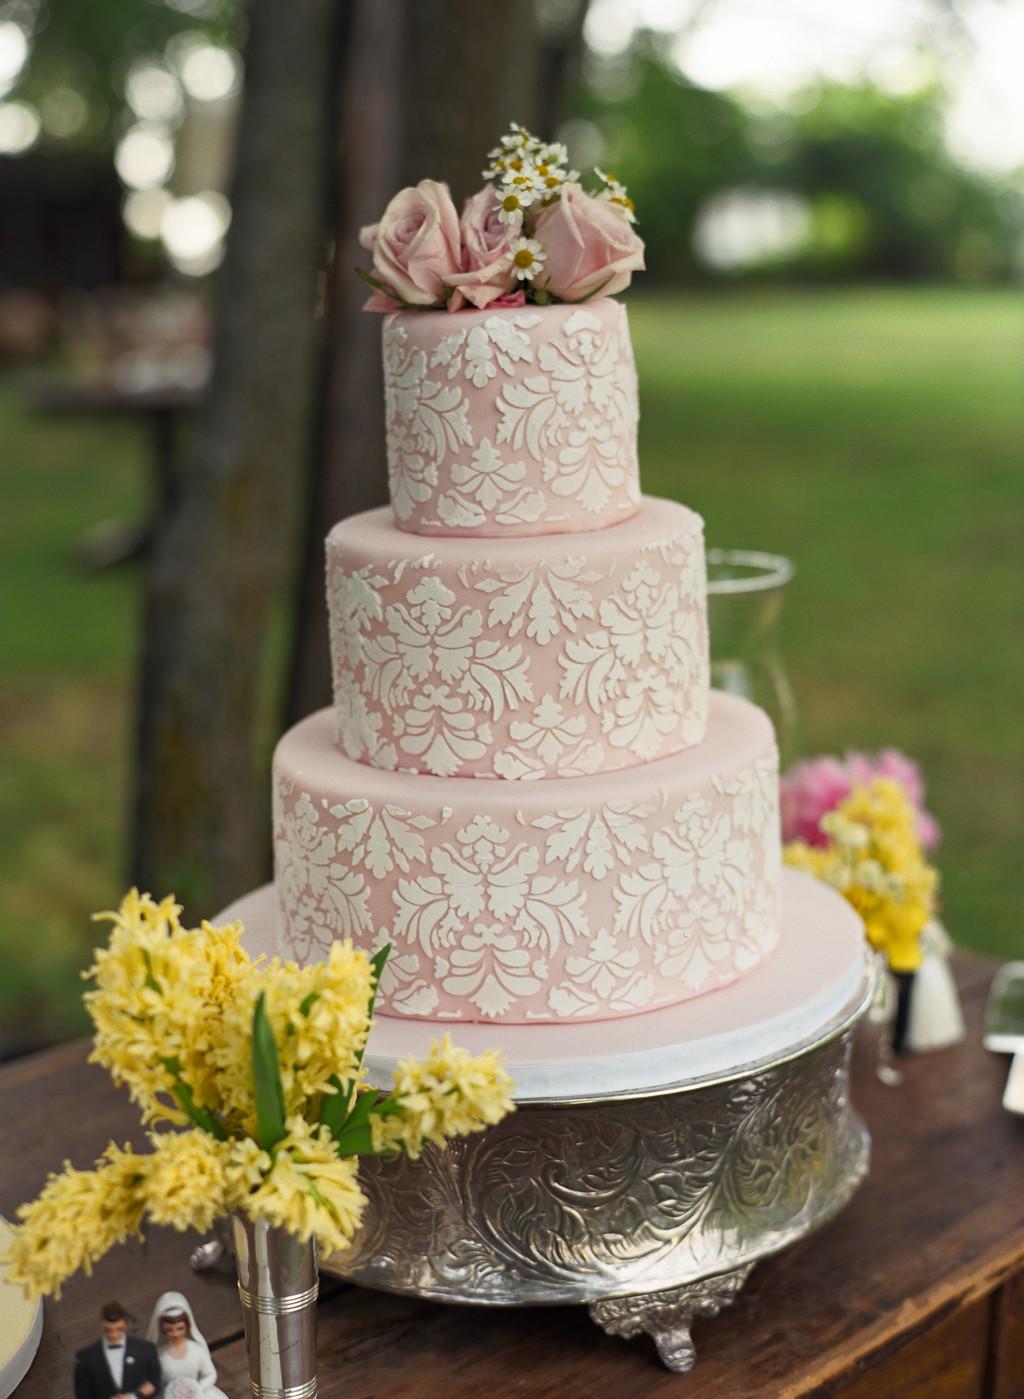 Vintage Wedding Cakes  wedding cake toppers Fireman Cake Toppers For Wedding Cakes